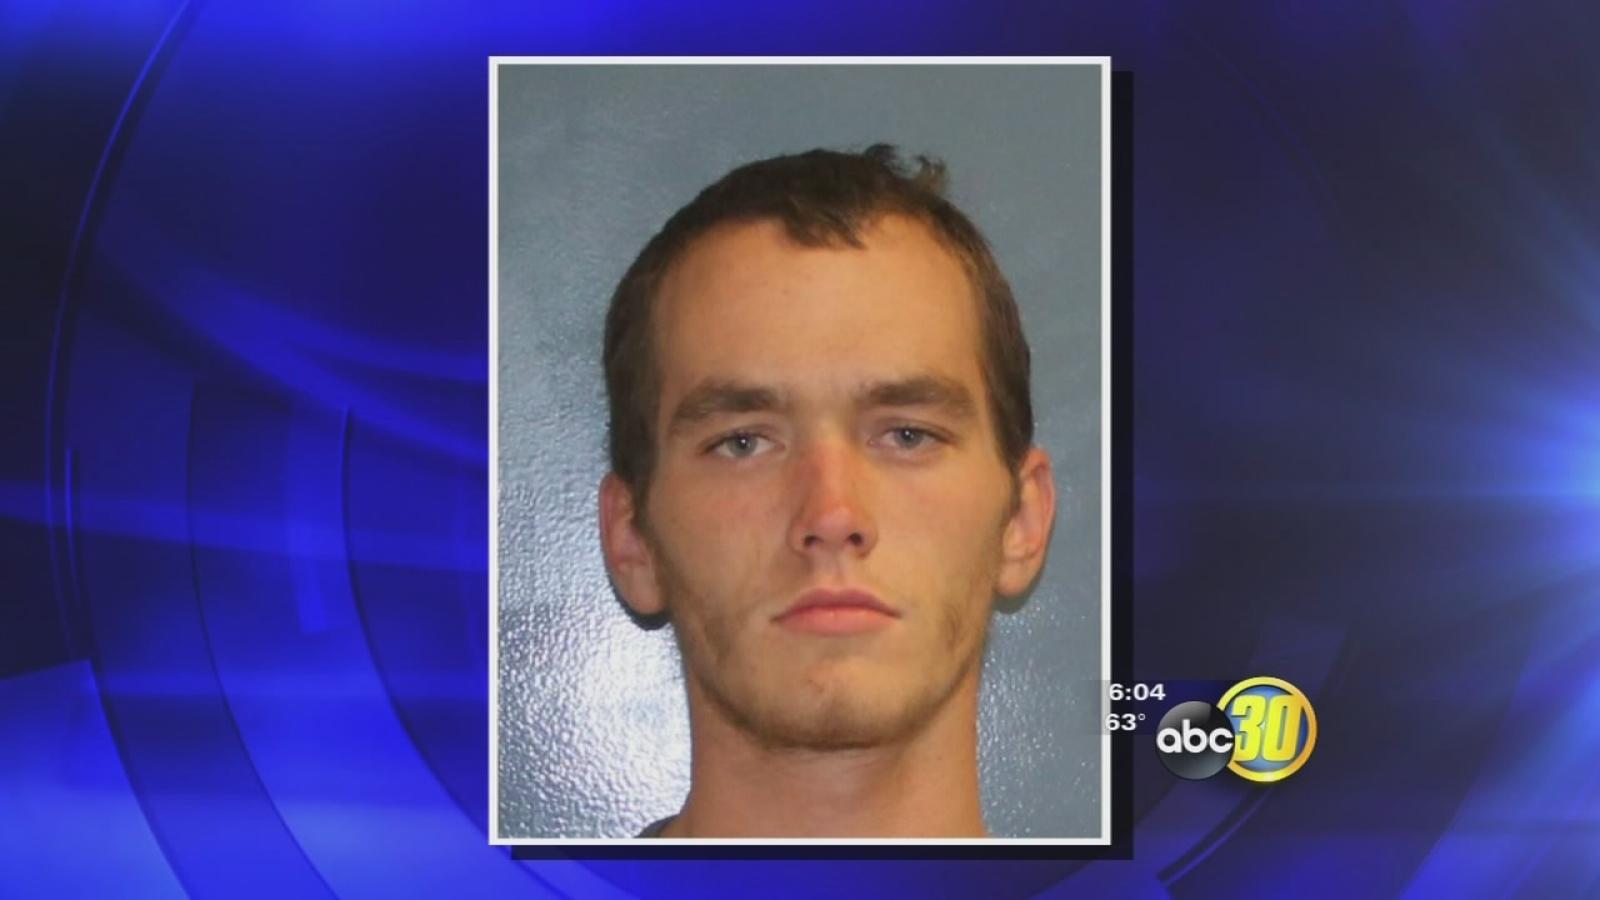 Bathtub Burglar: California suspect found naked in bathtub